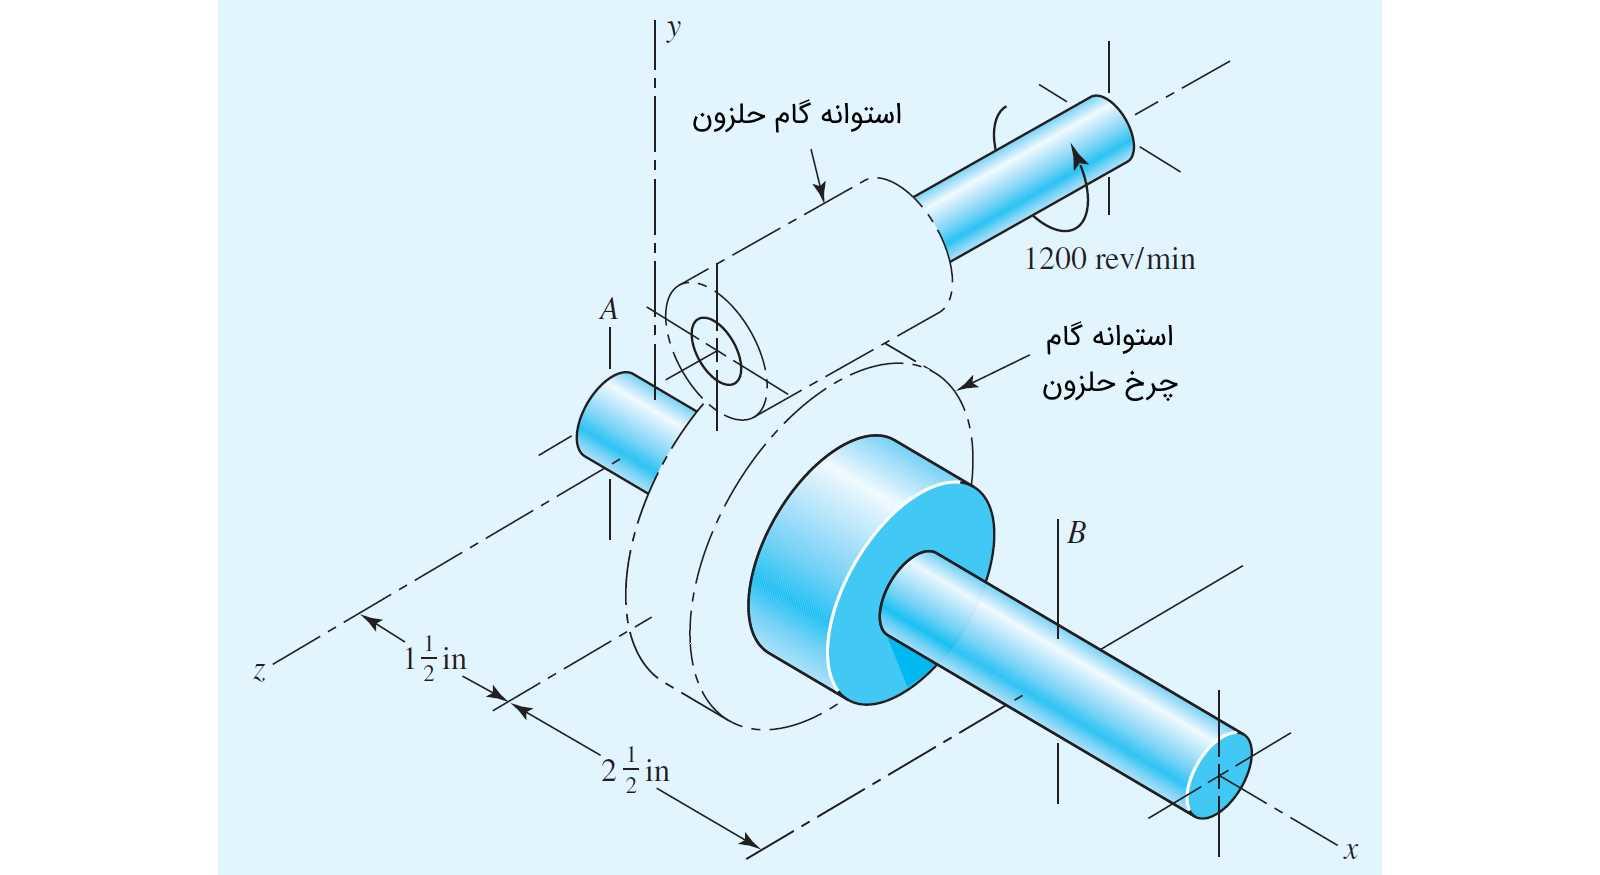 مثال حل شده چرخدنده حلزونی